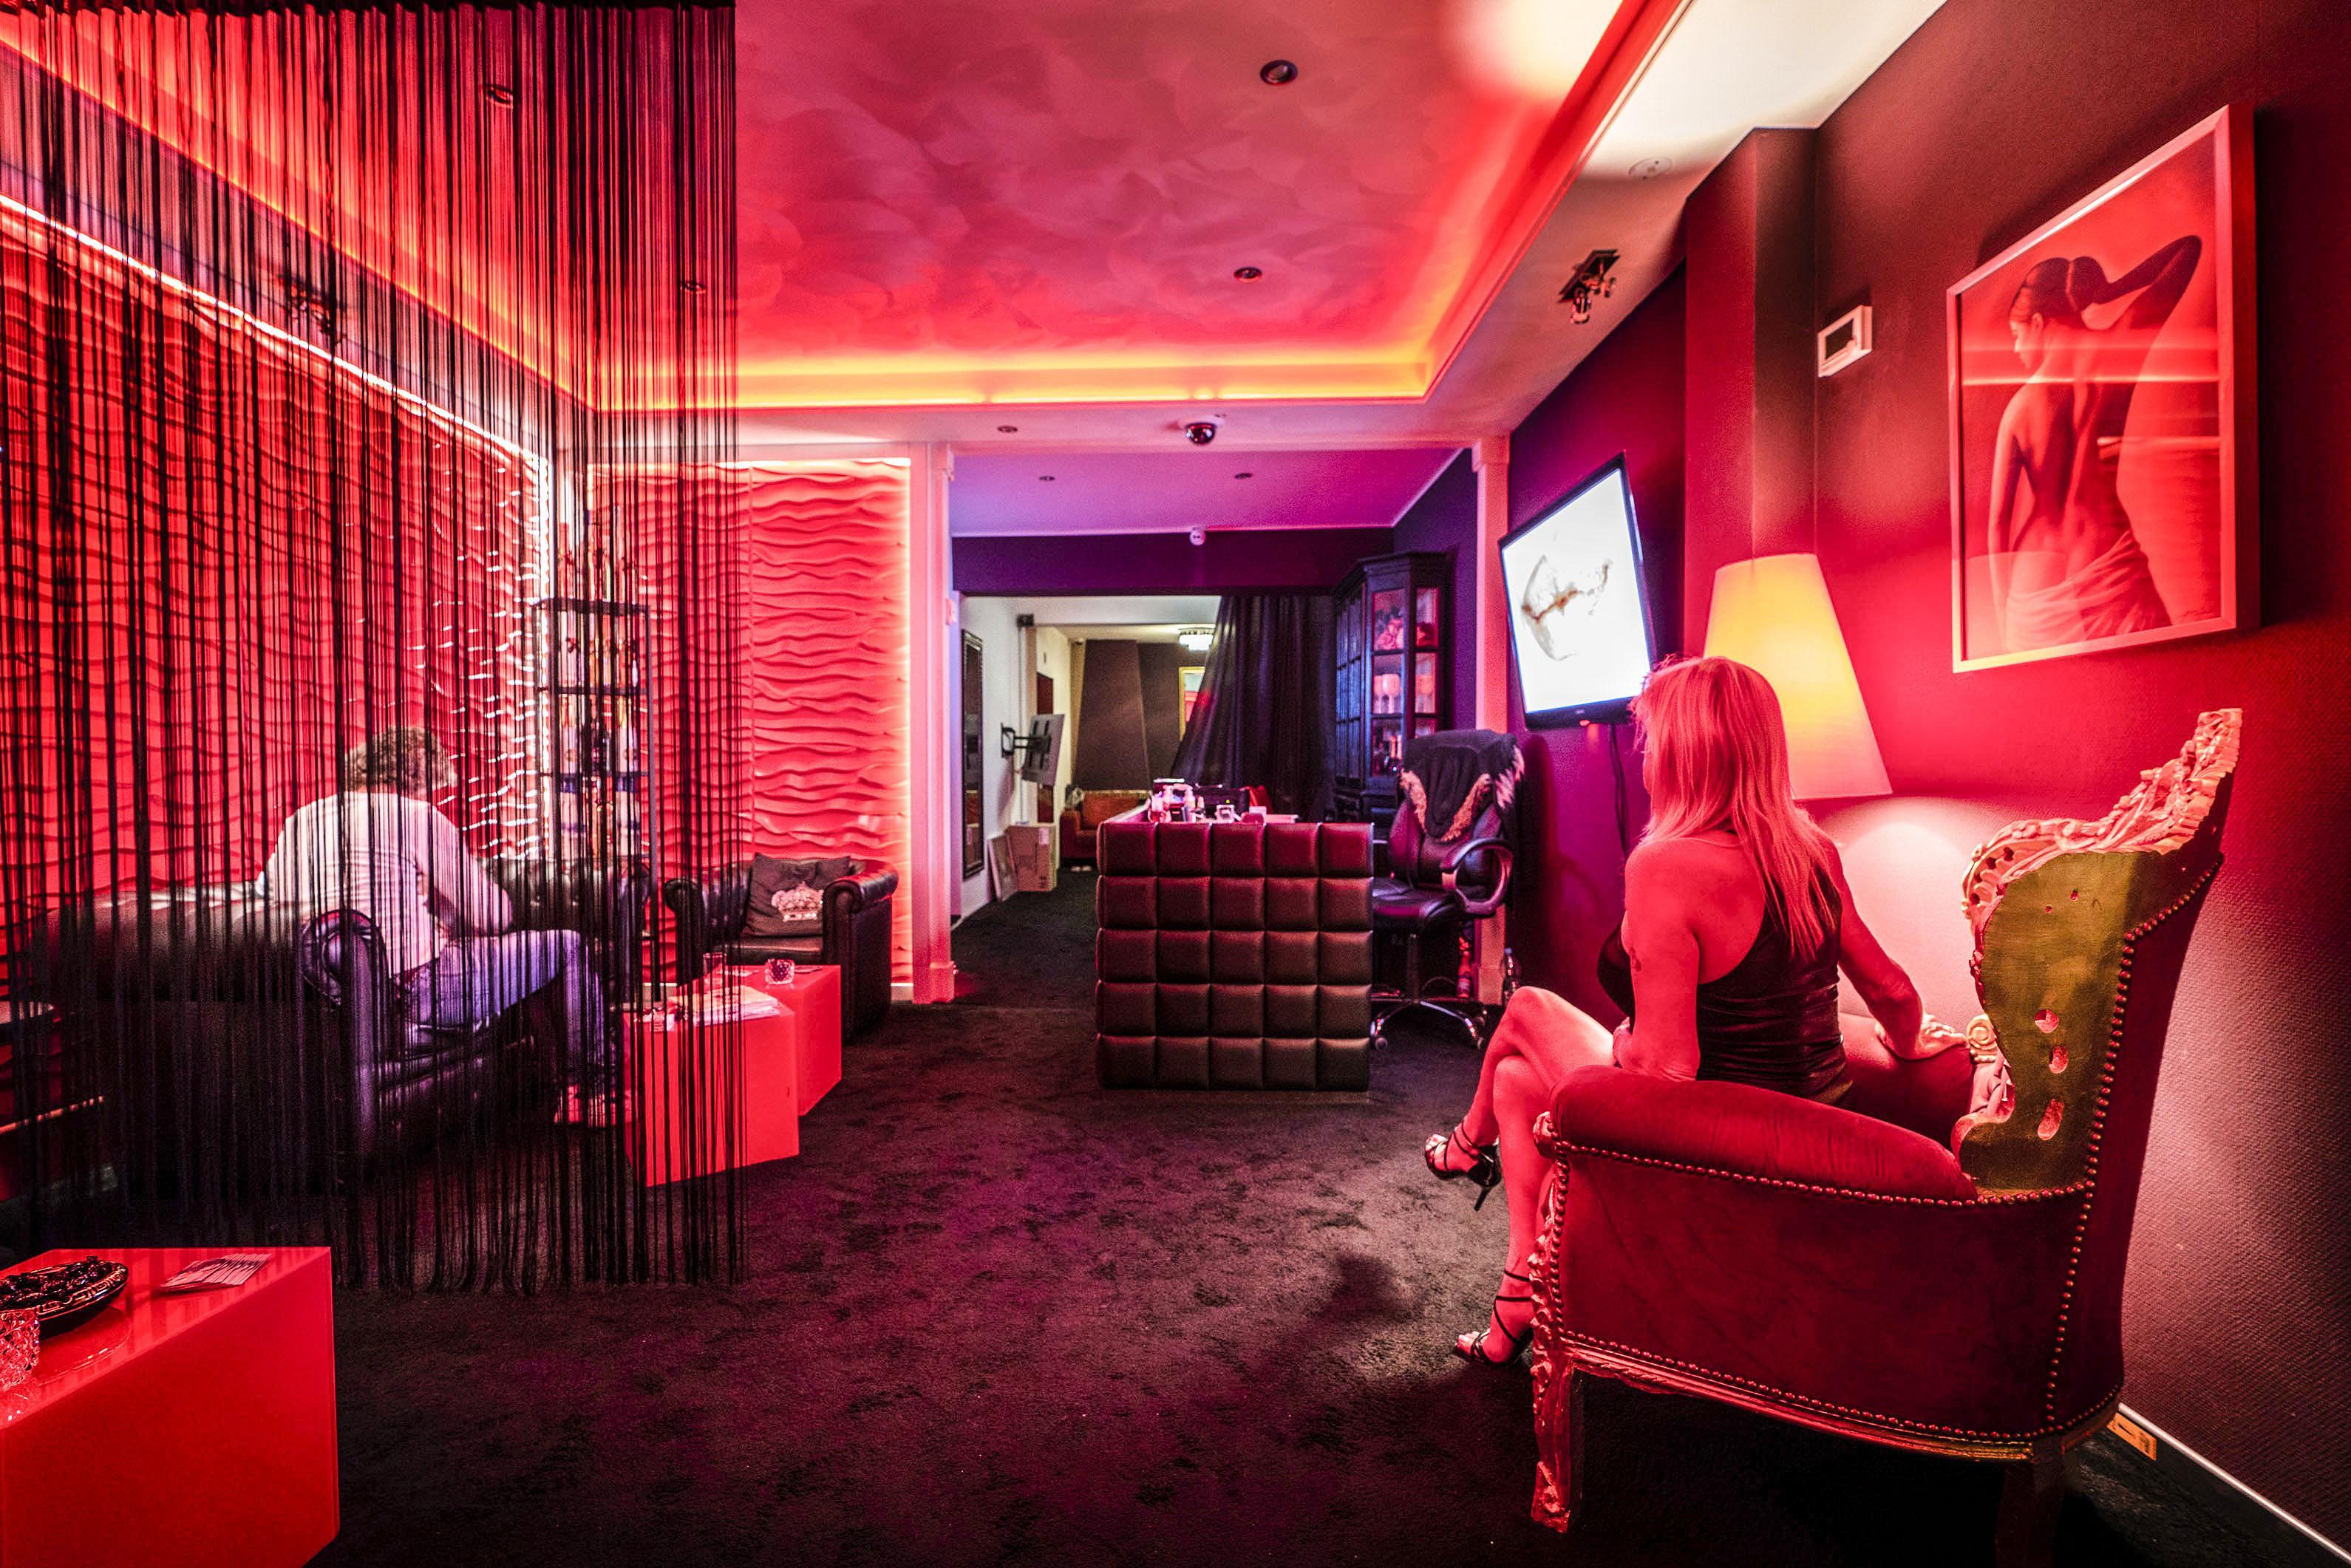 Club sauna yin yang Saunaclub